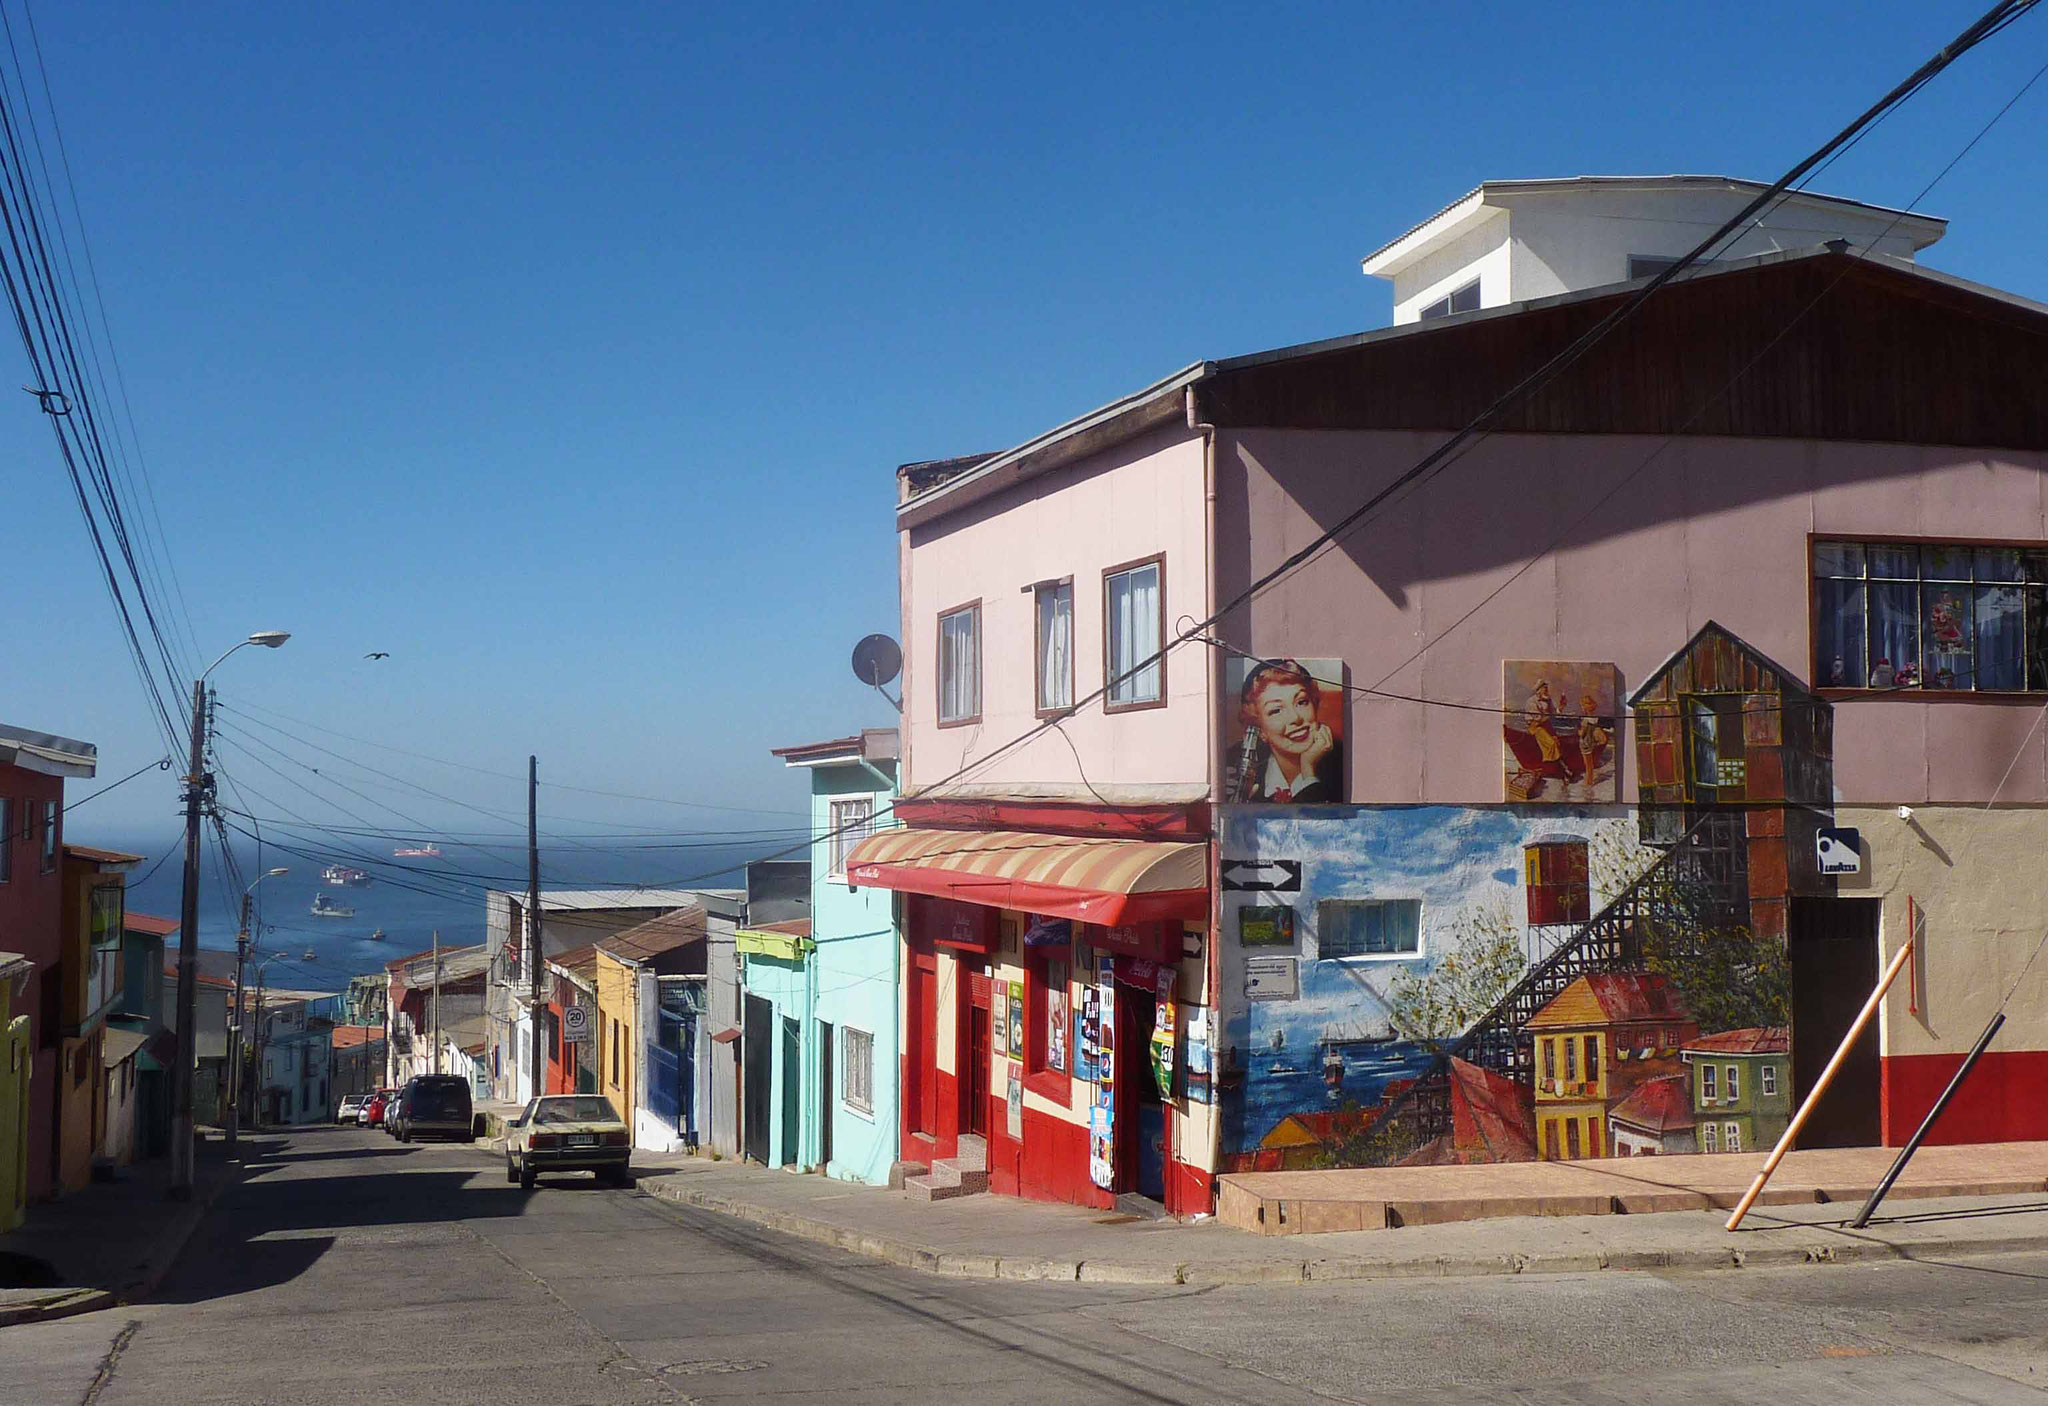 La rue Ferrari, rue des poètes (F. Garcia Lorca, P. Neruda...)